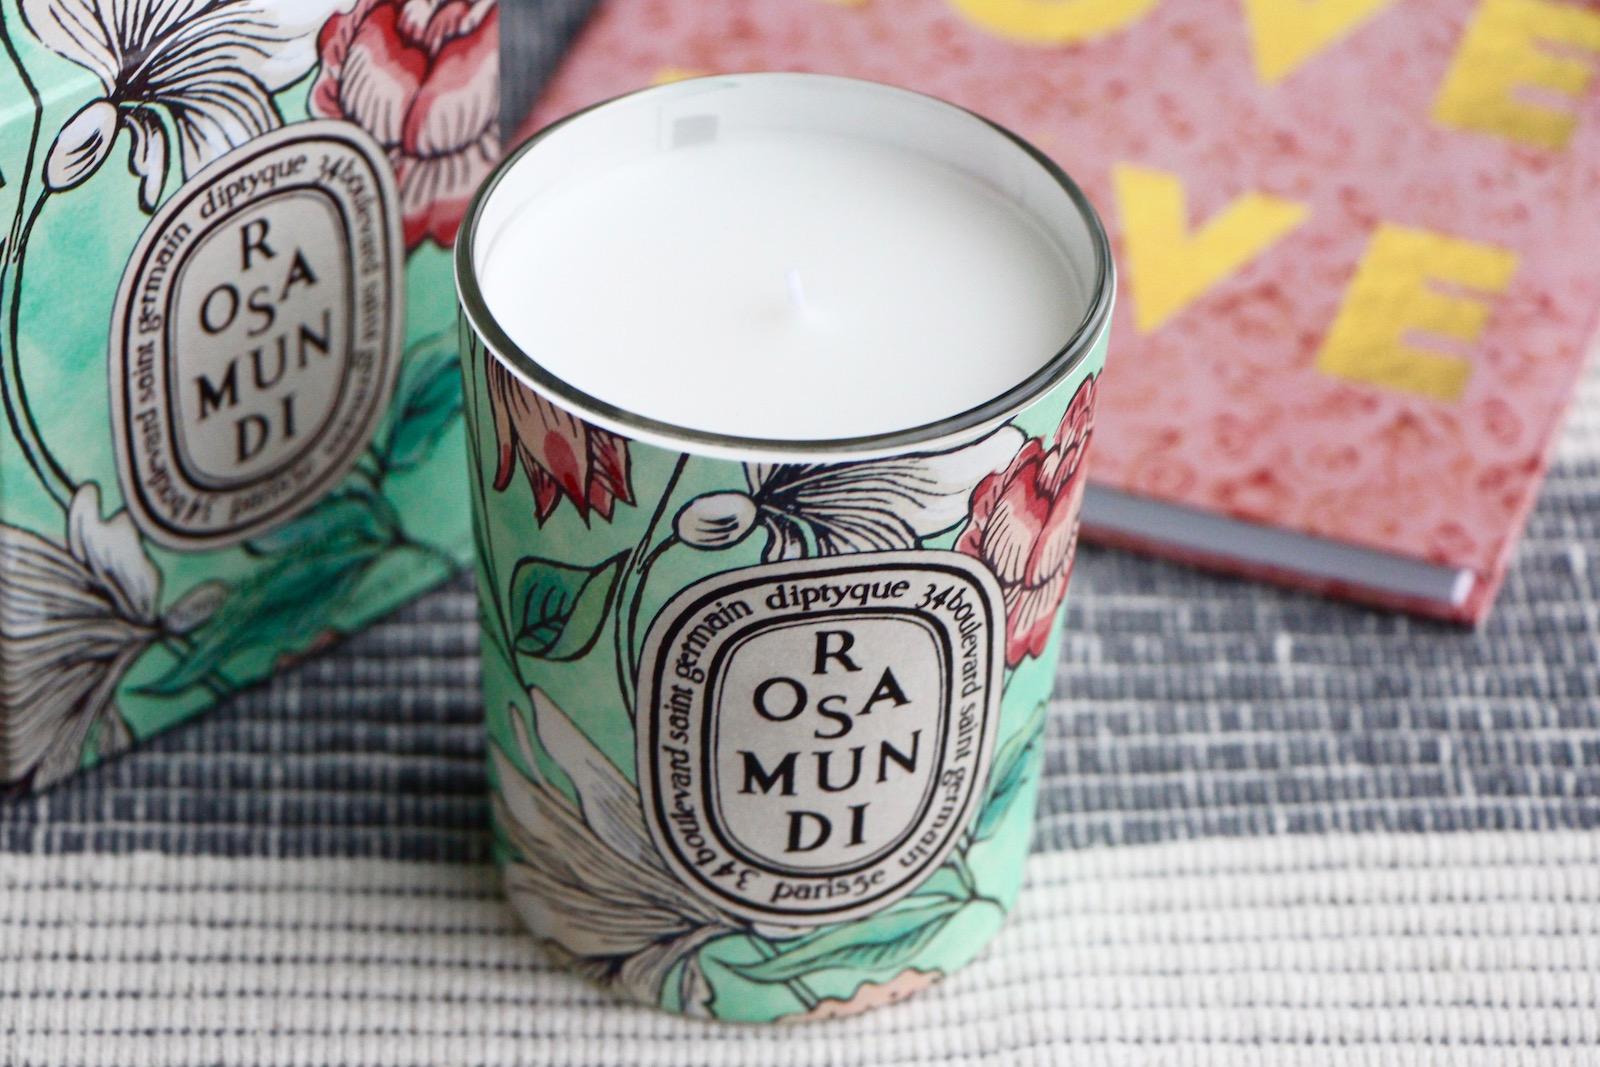 diptyque rosamundi candle